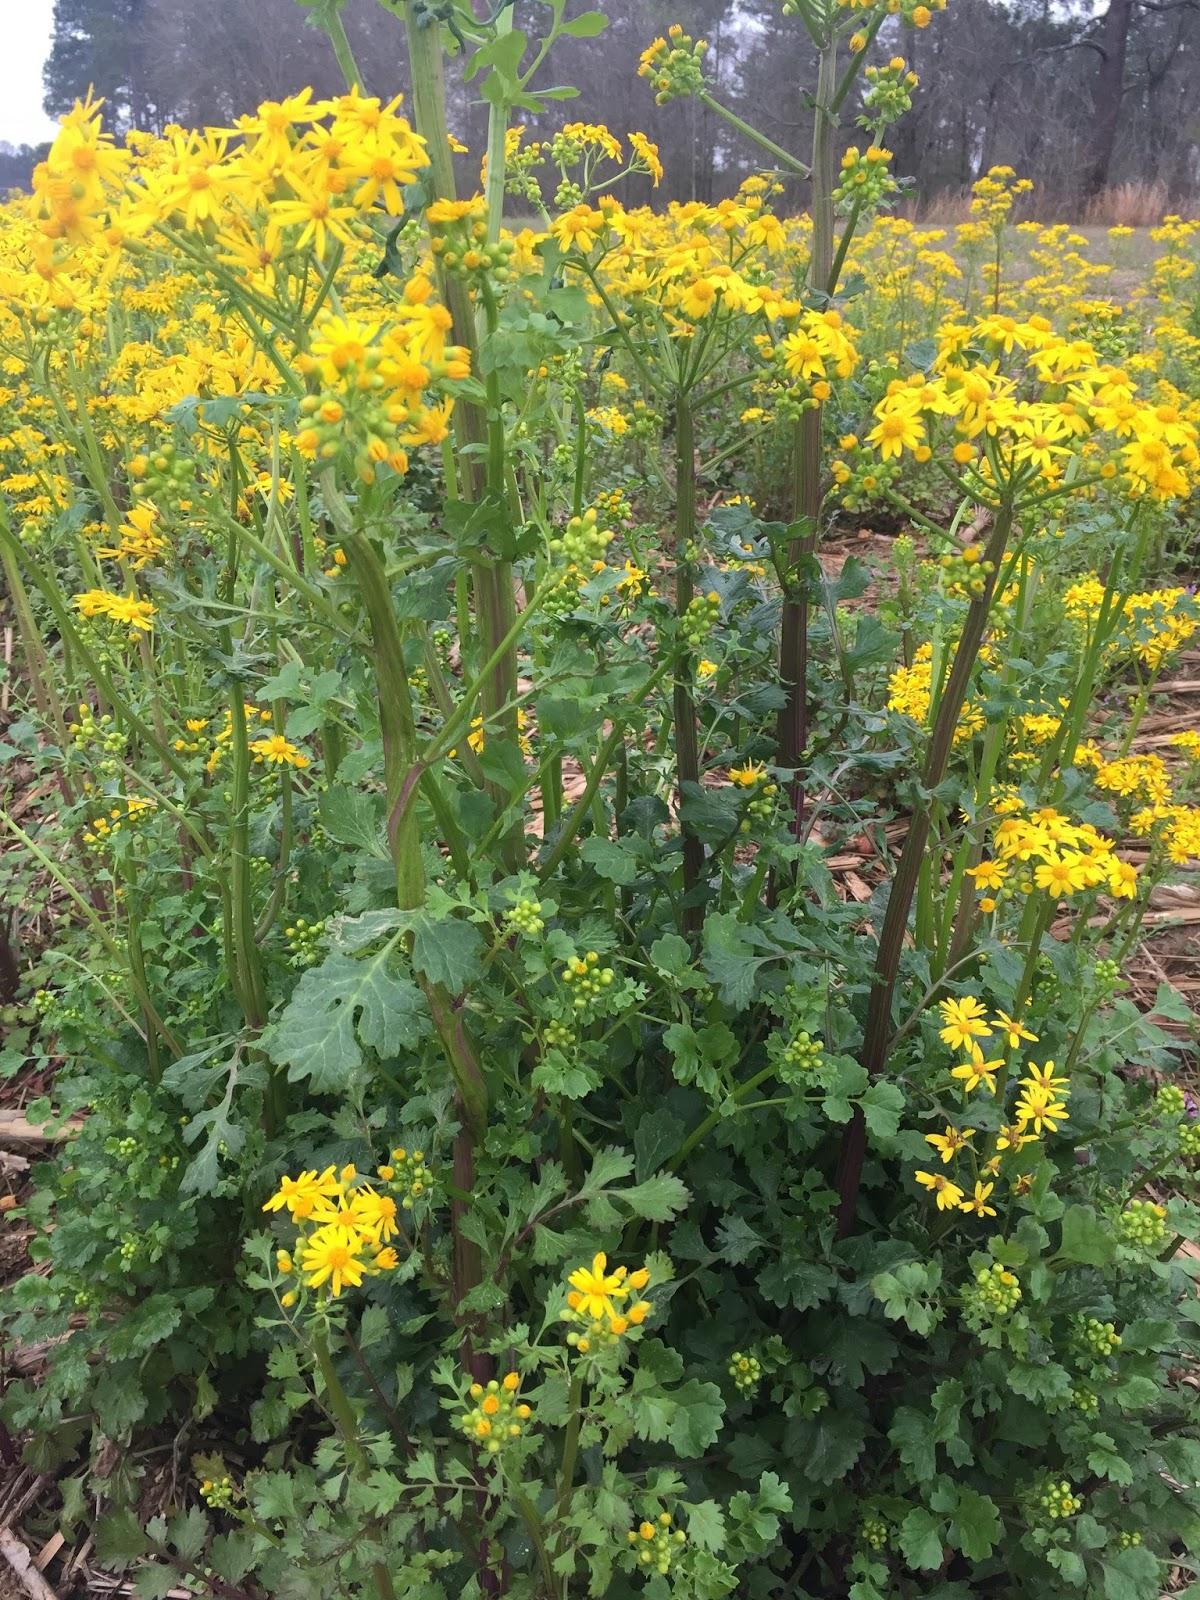 Georgia 4 Early Season Weed Considerations Agfax